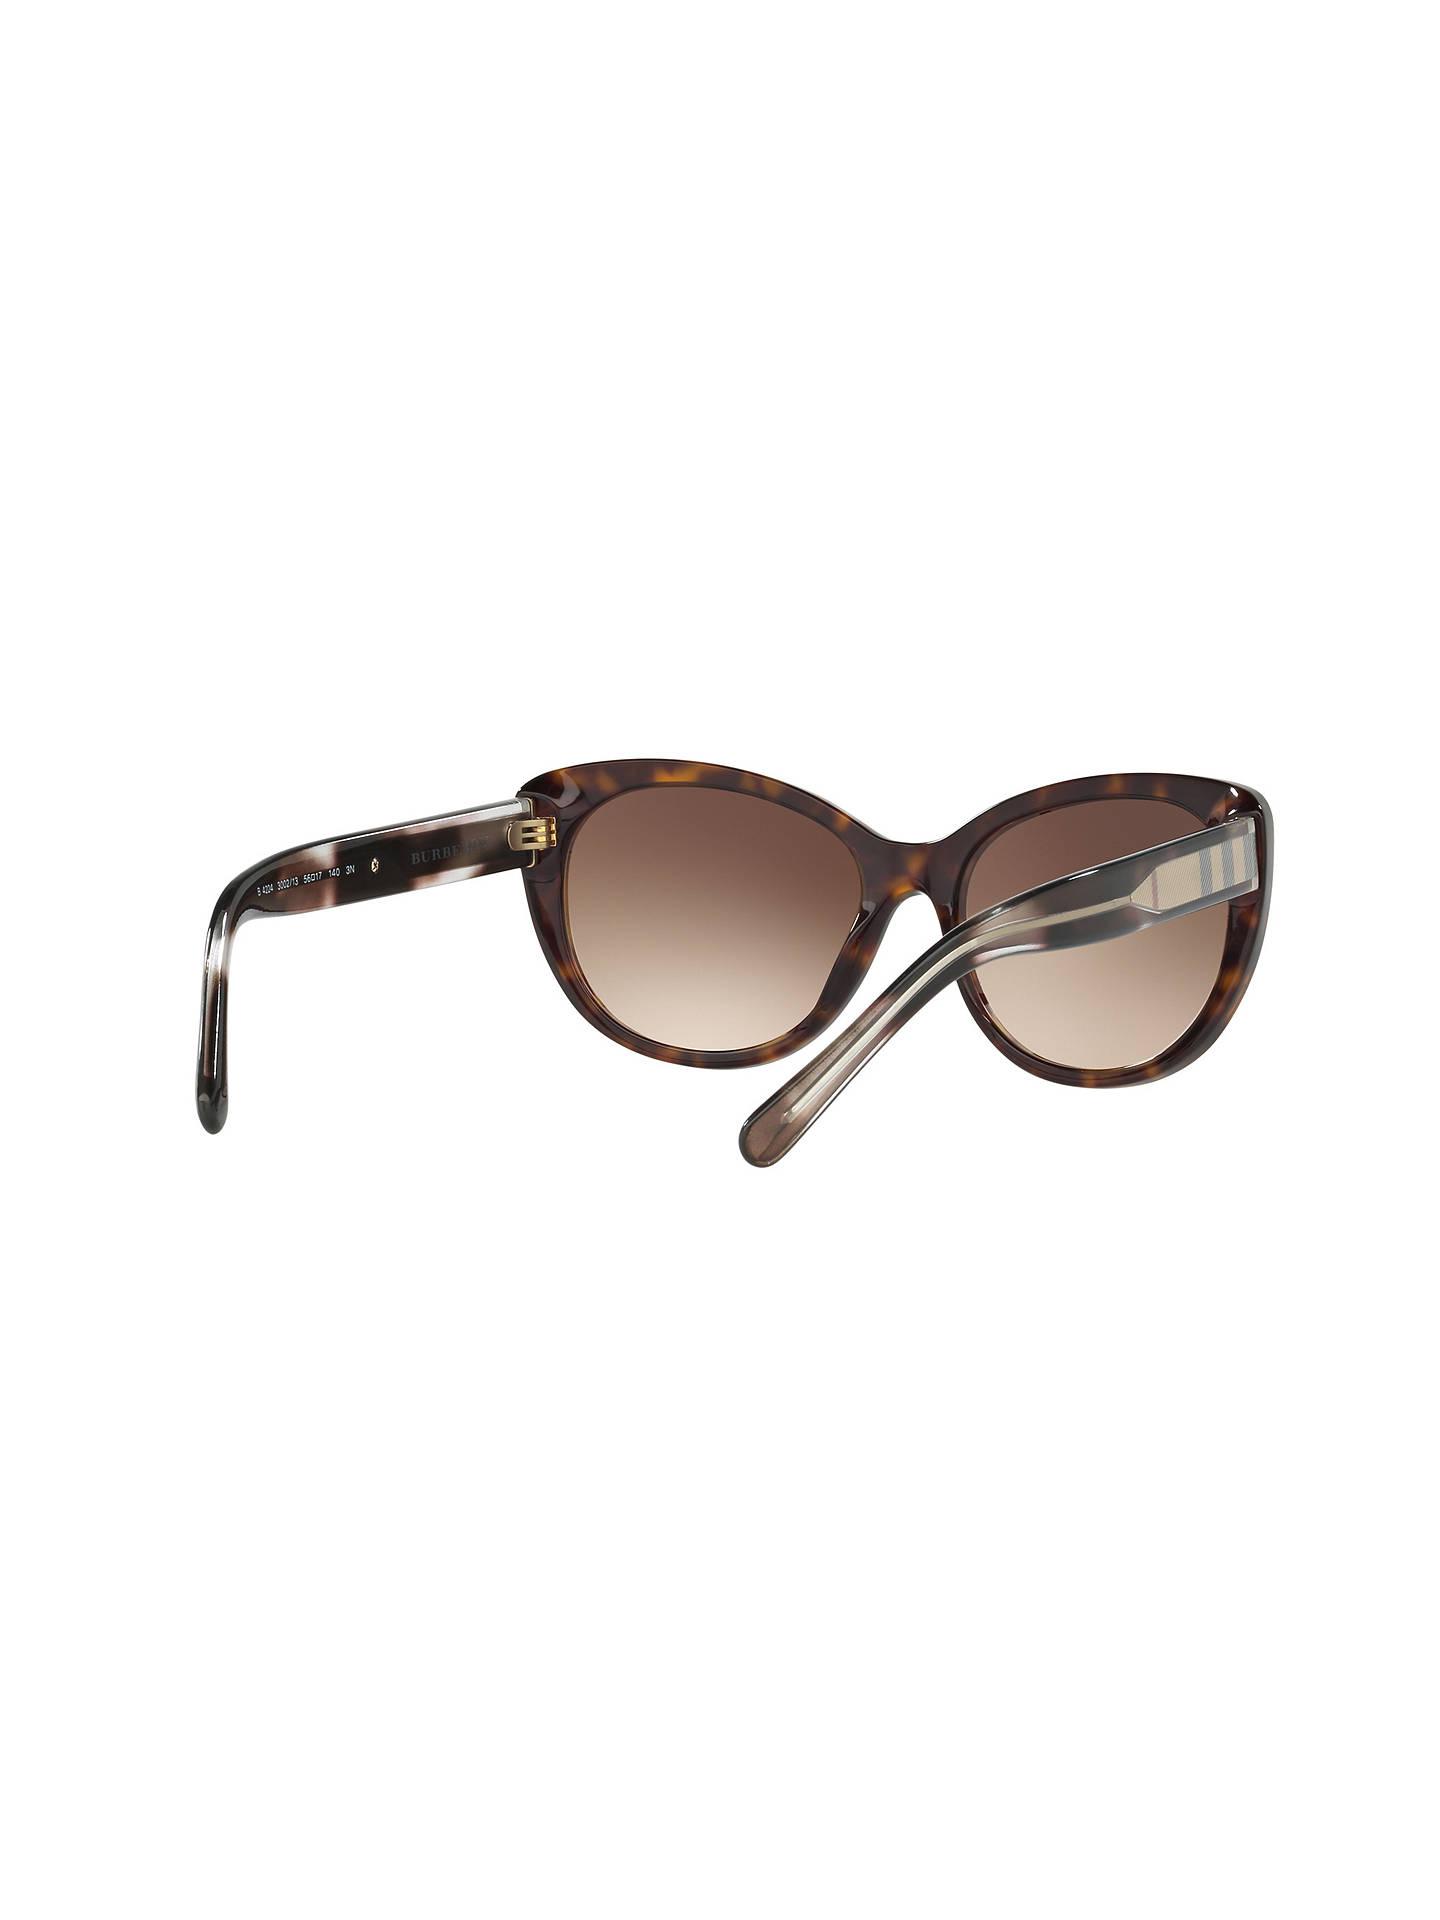 eab285ac714c ... Buy Burberry BE4224 Cat s Eye Sunglasses